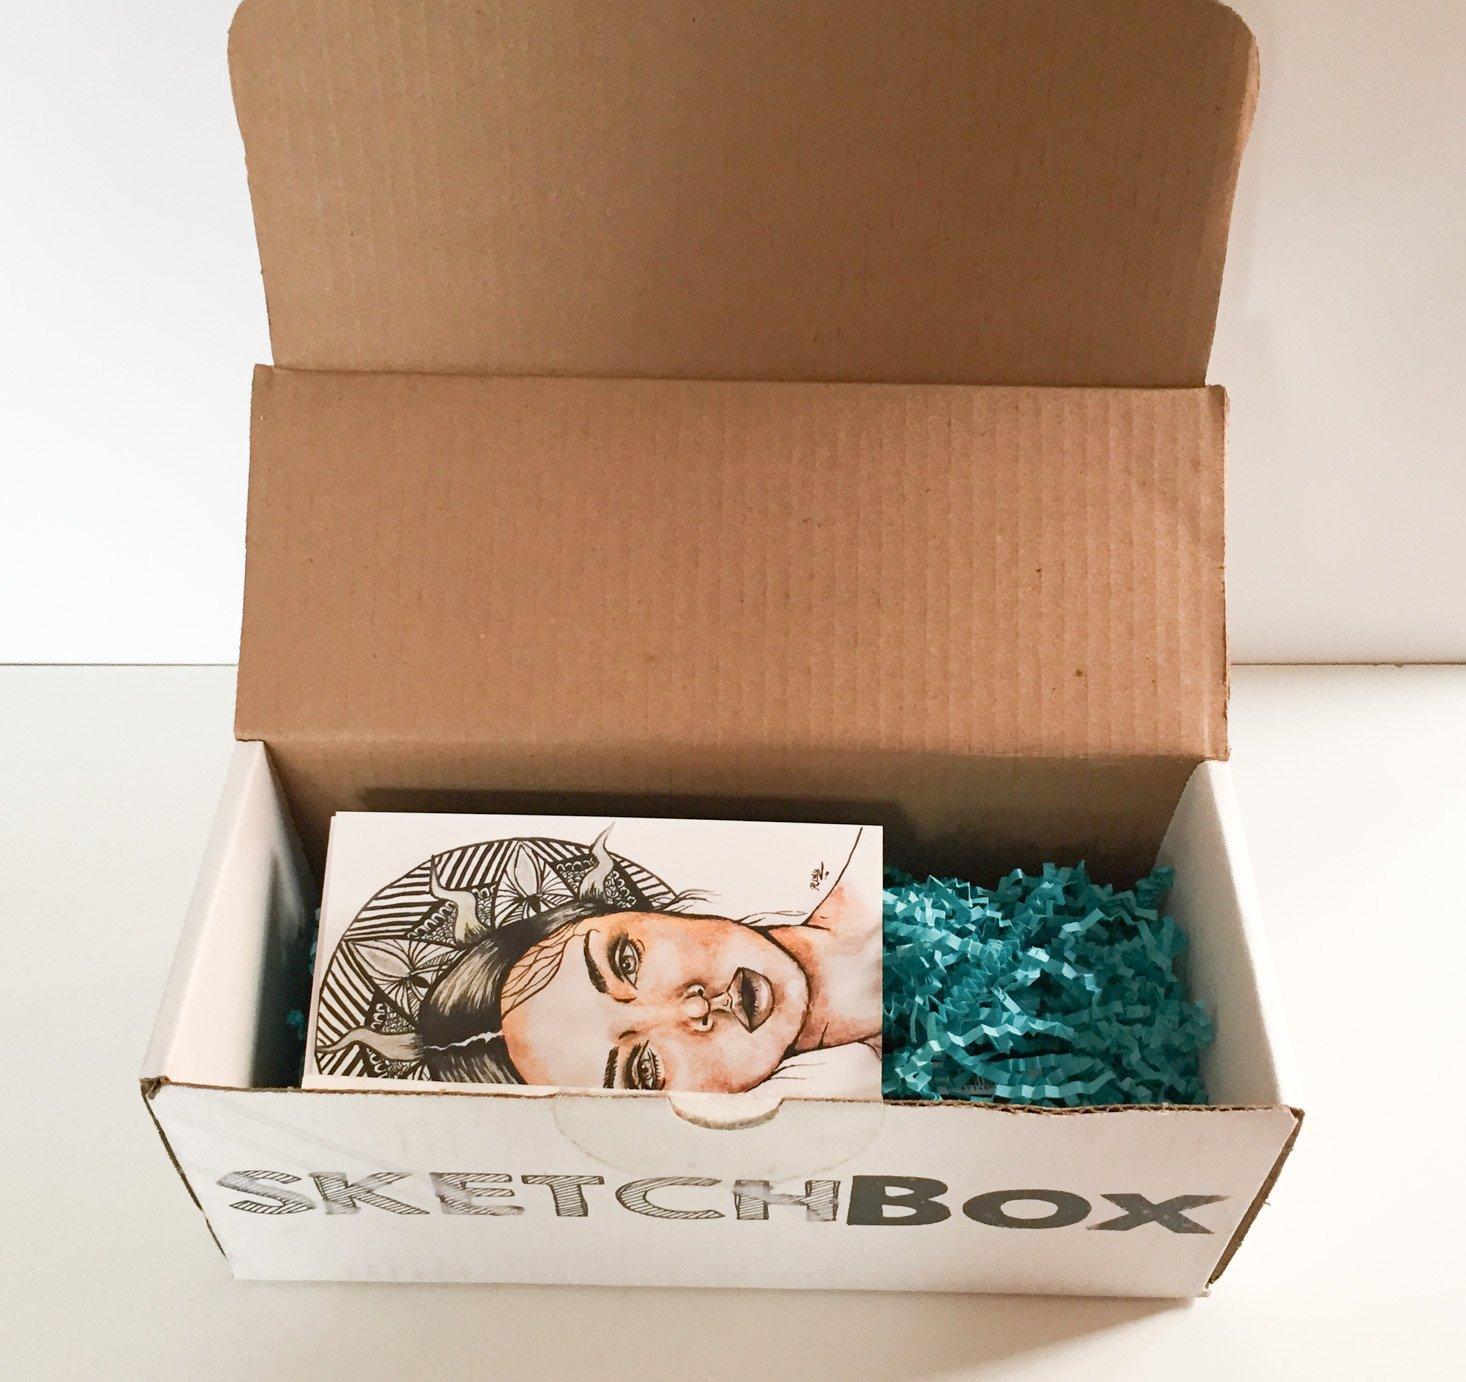 sketchbox-january-2017-box-inside